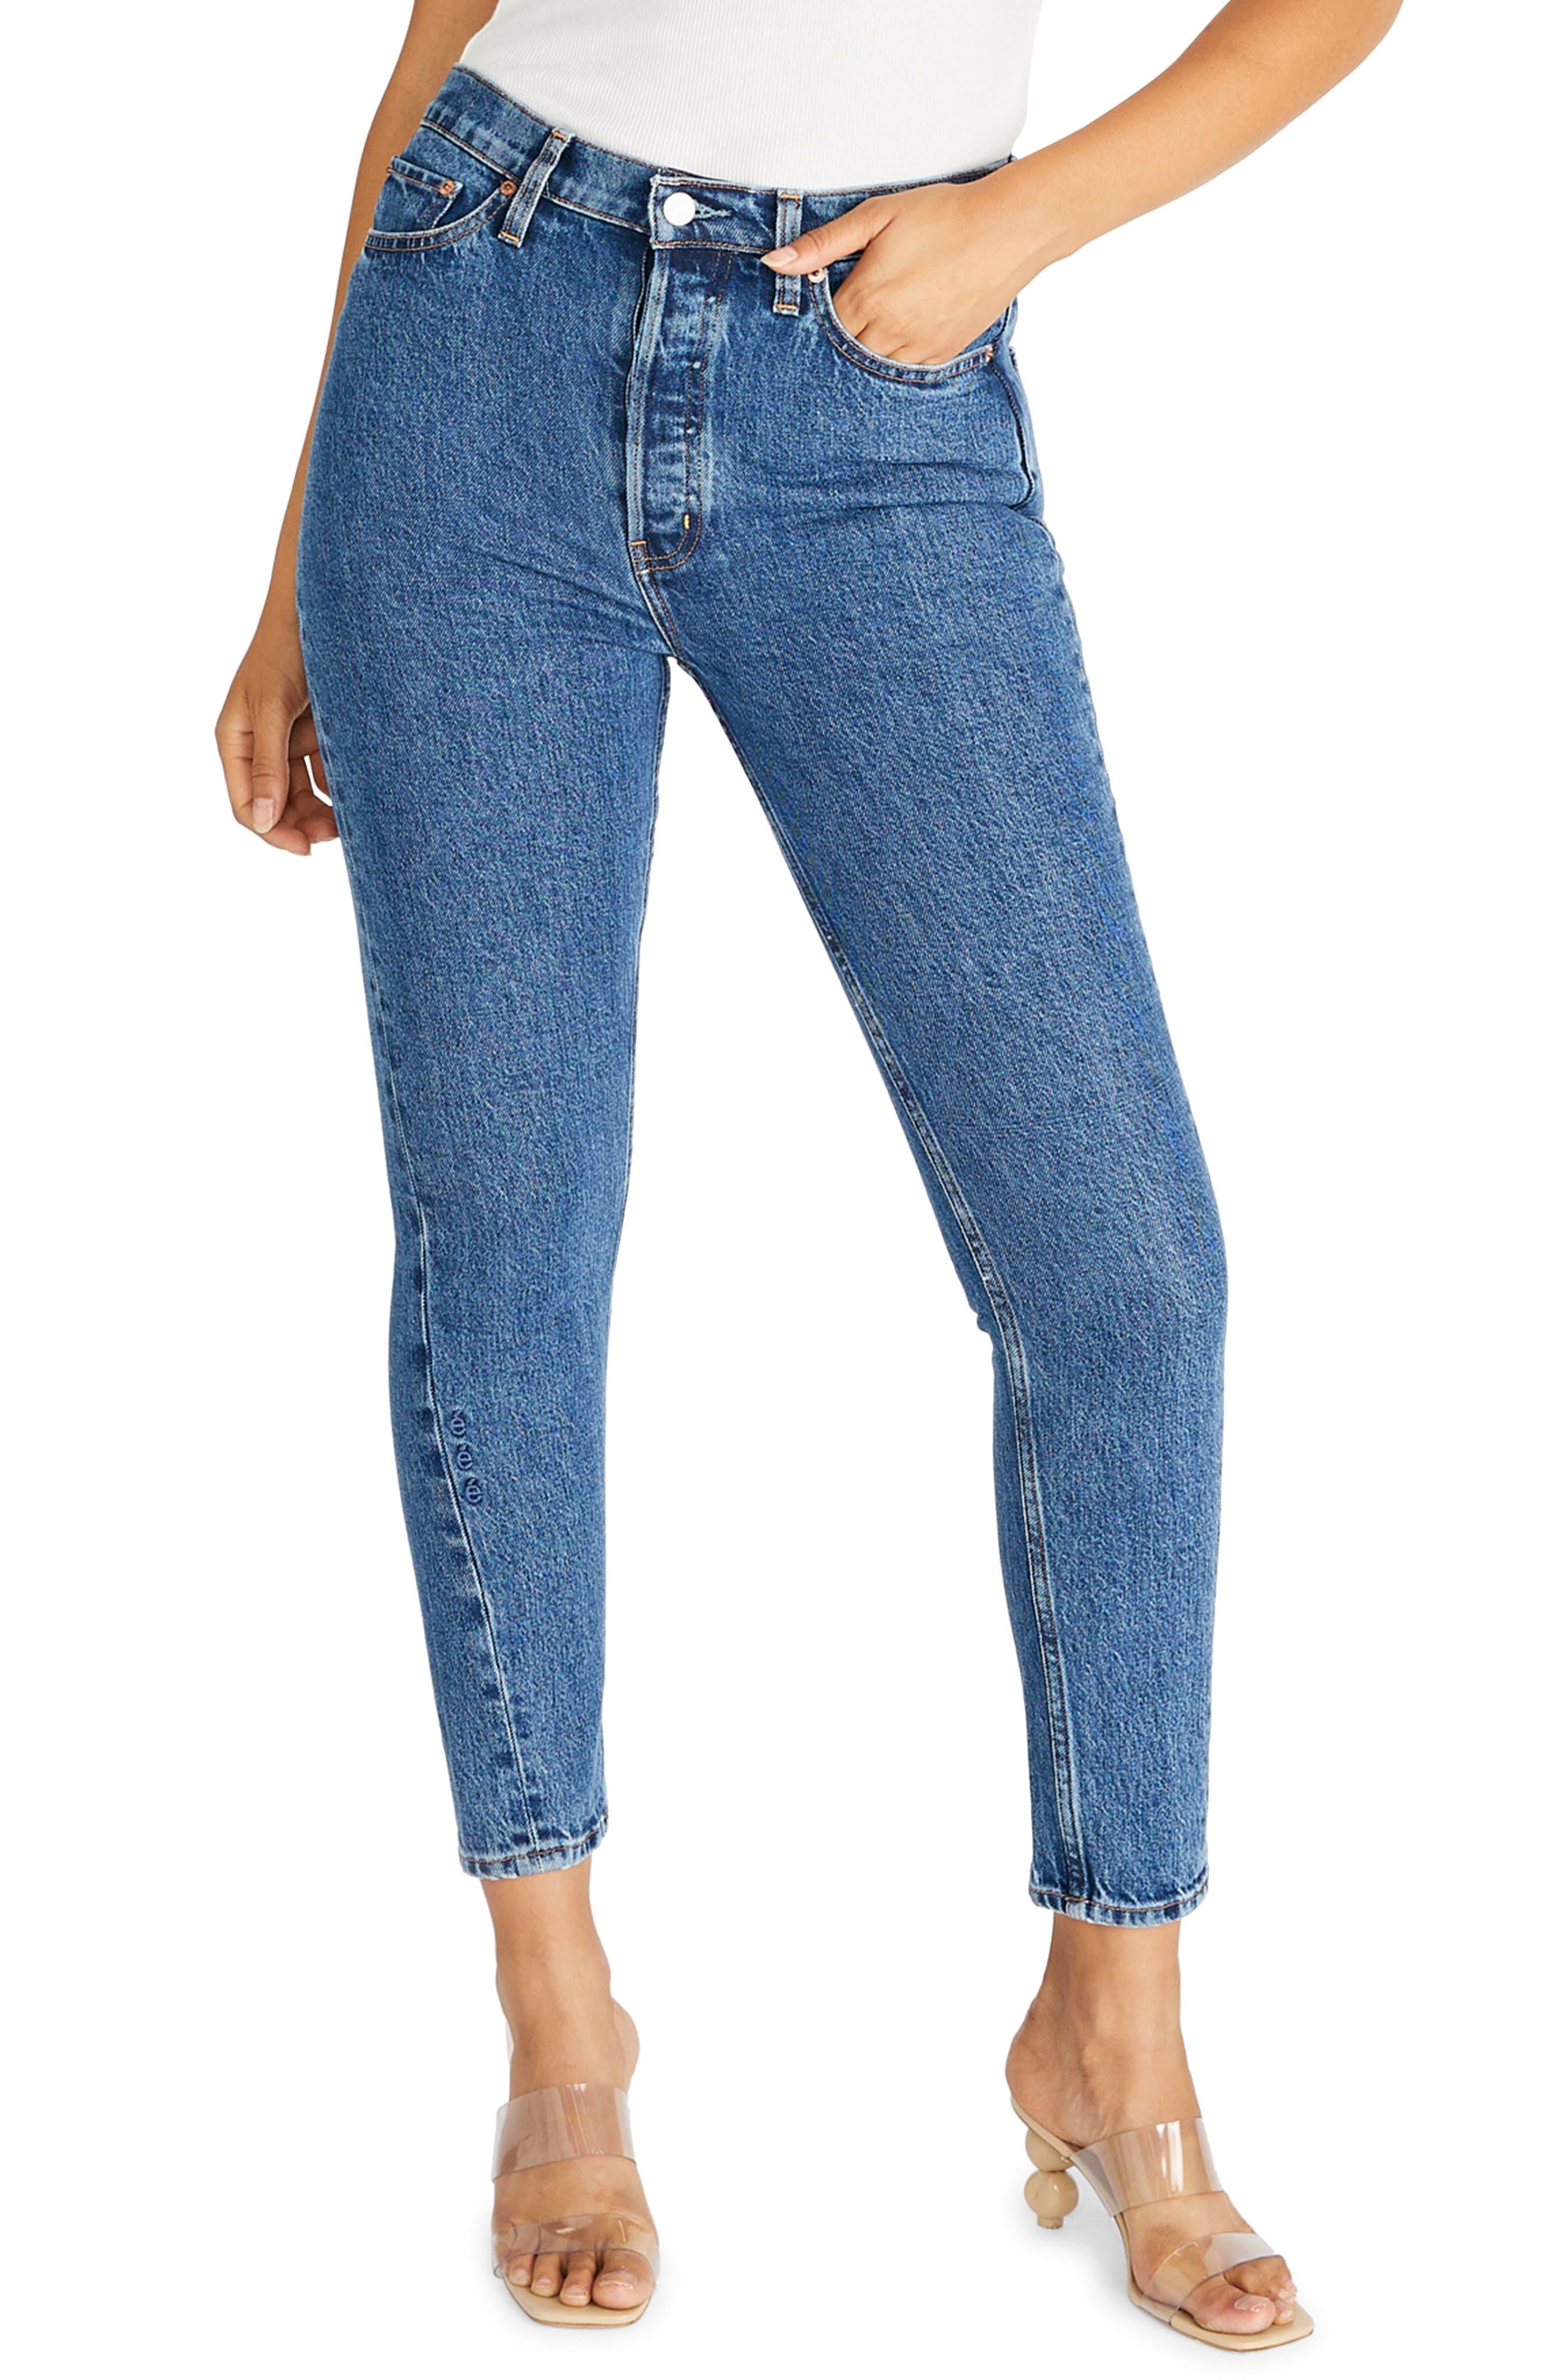 Women's Etica Alex Twist Seam High Waist Ankle Skinny Jeans